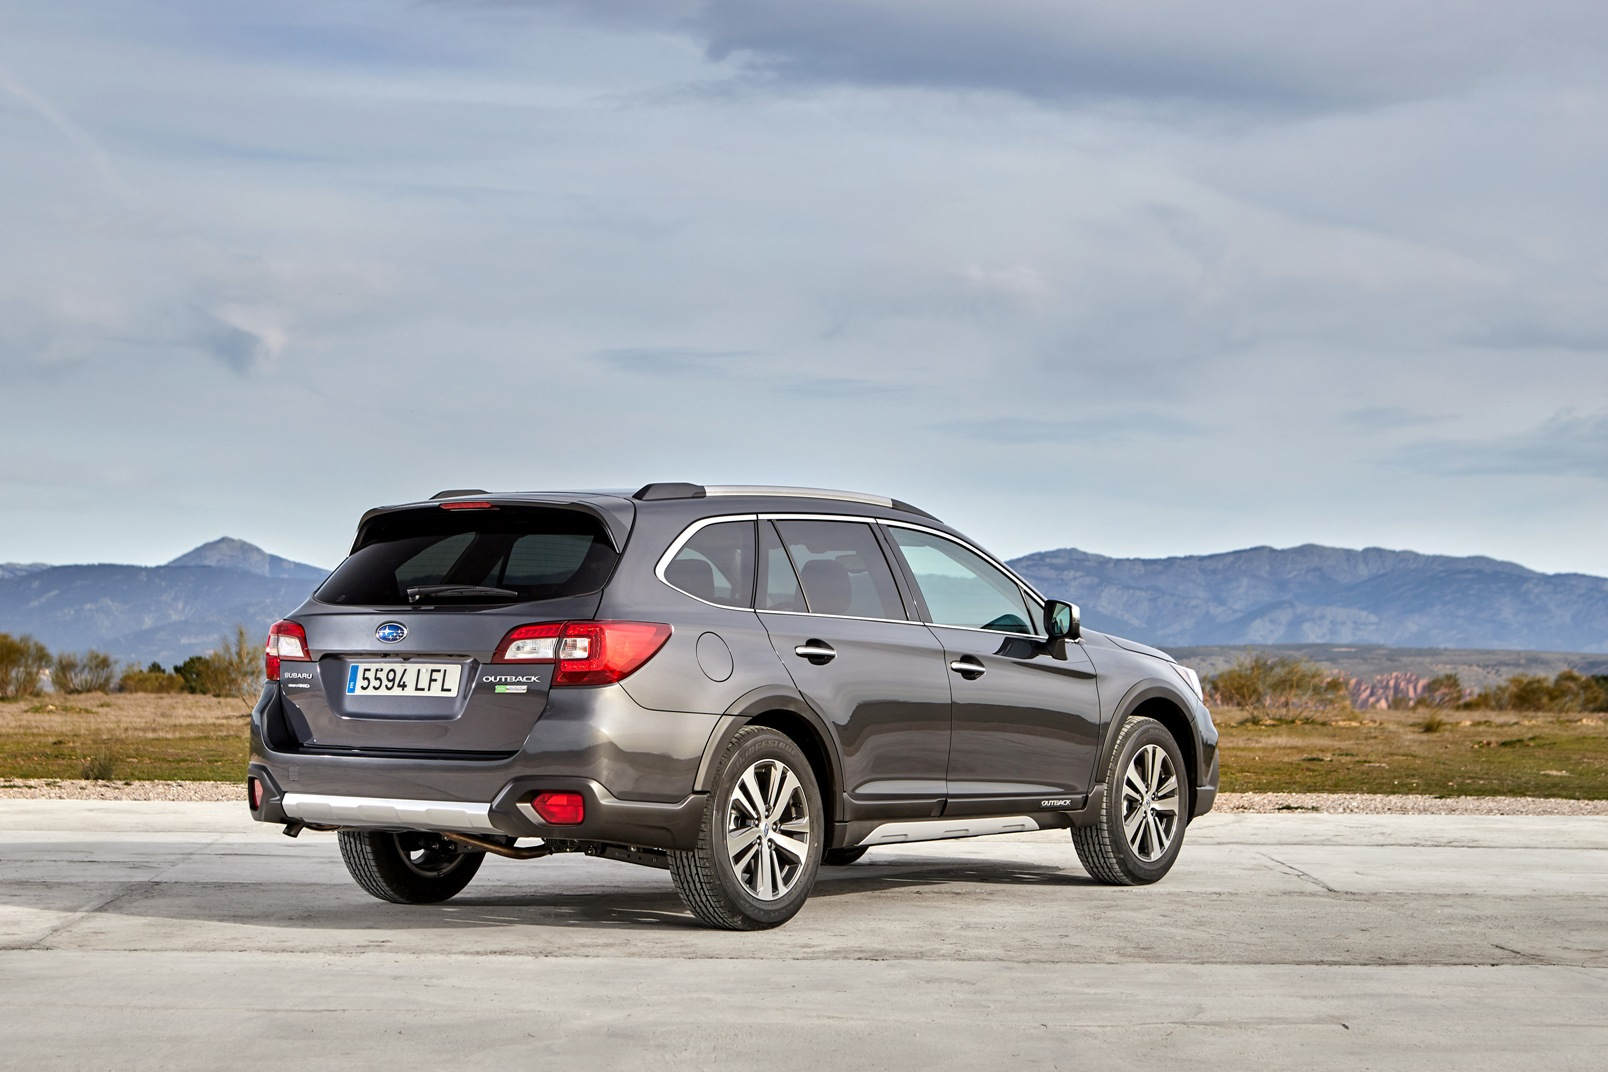 Subaru Outback Silver Edition 2020 (20)